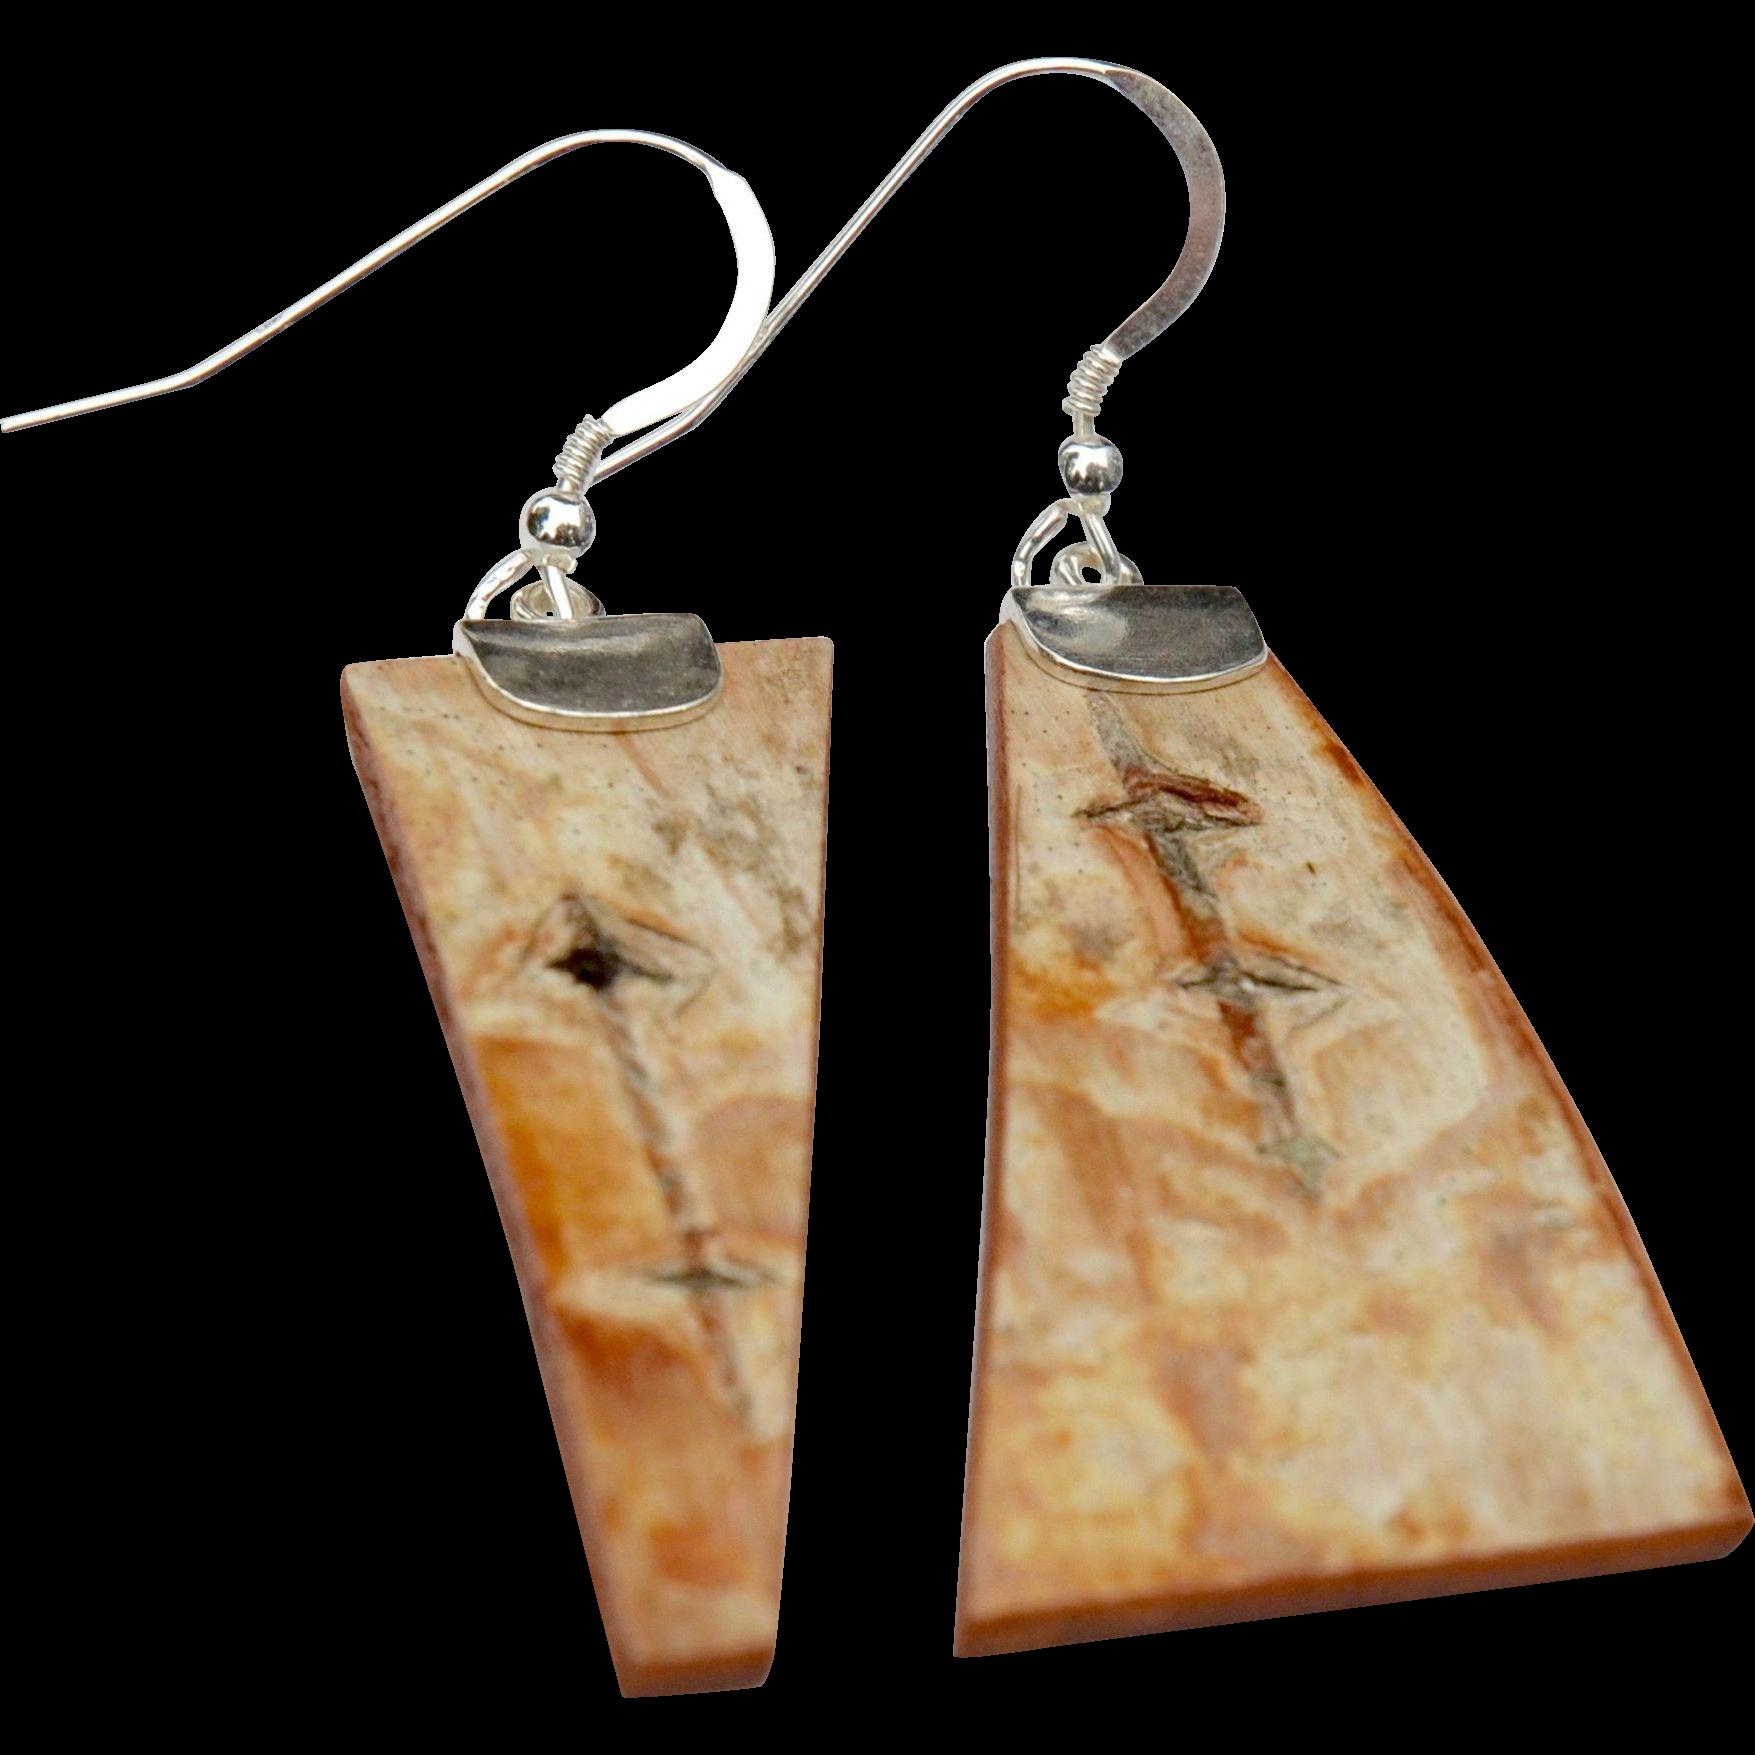 Abstract Birch Bark Earrings